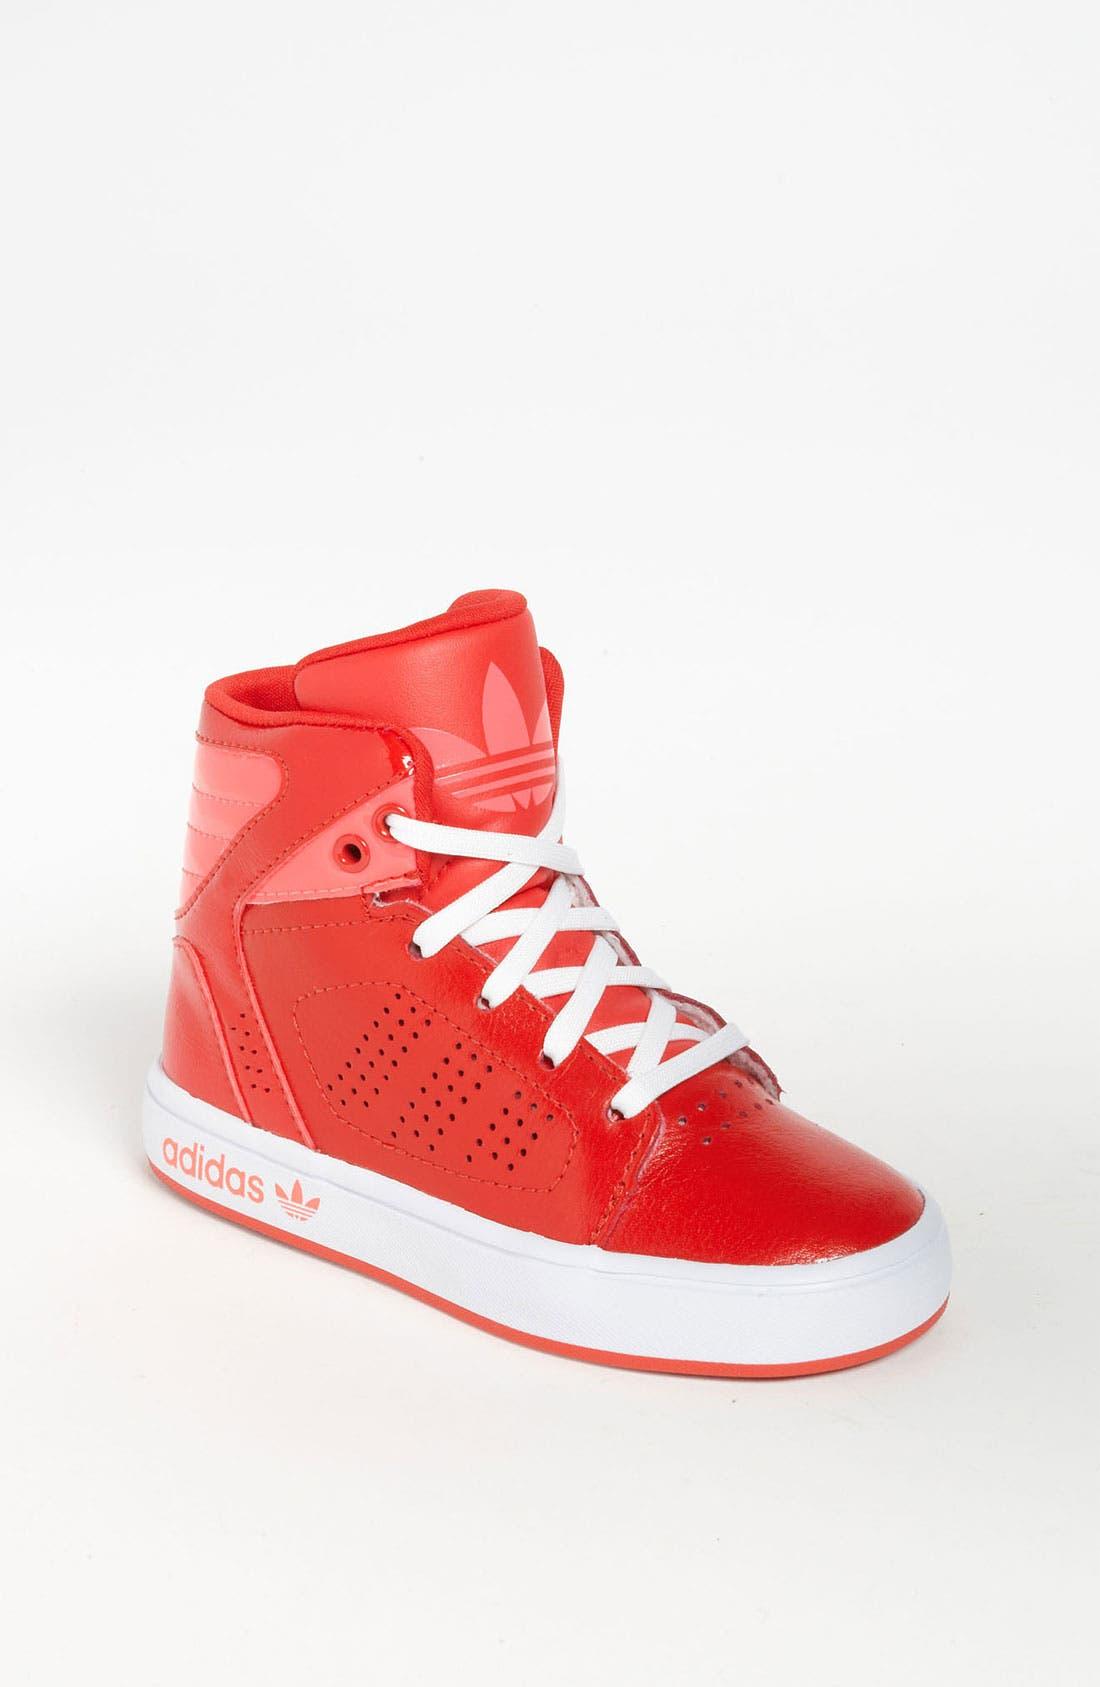 Main Image - adidas 'Adi-High Ext' High Top Sneaker (Baby, Walker & Toddler)